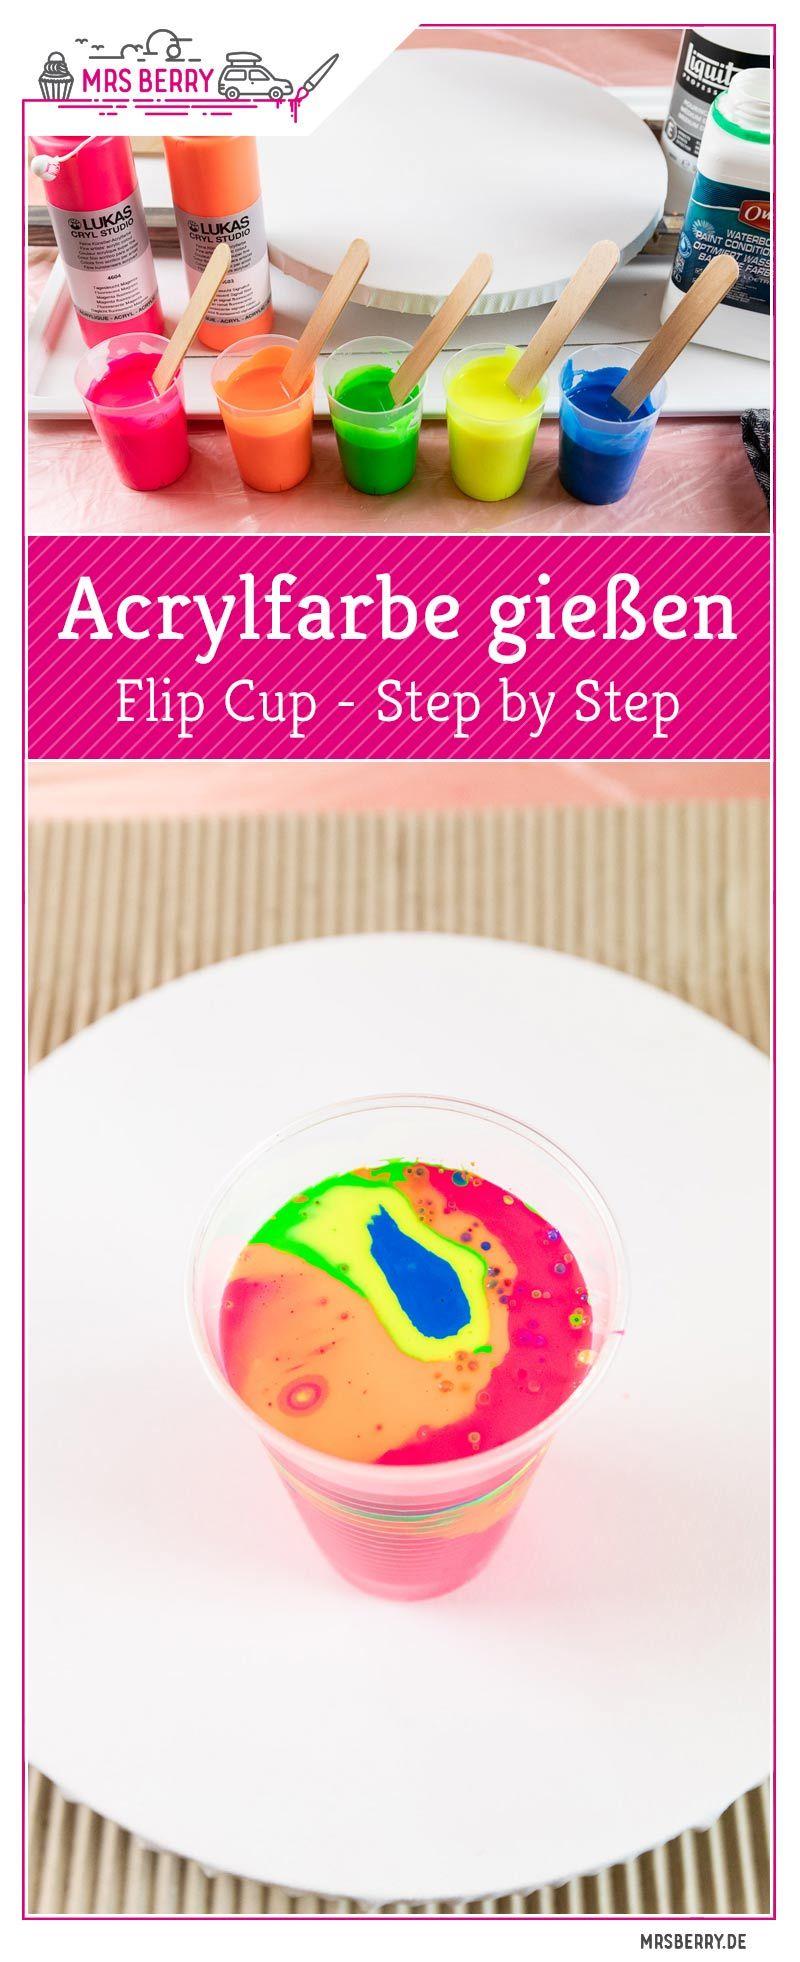 Acrylfarbe gießen - Acrylic Pouring der neue DIY Trend | MrsBerry.de